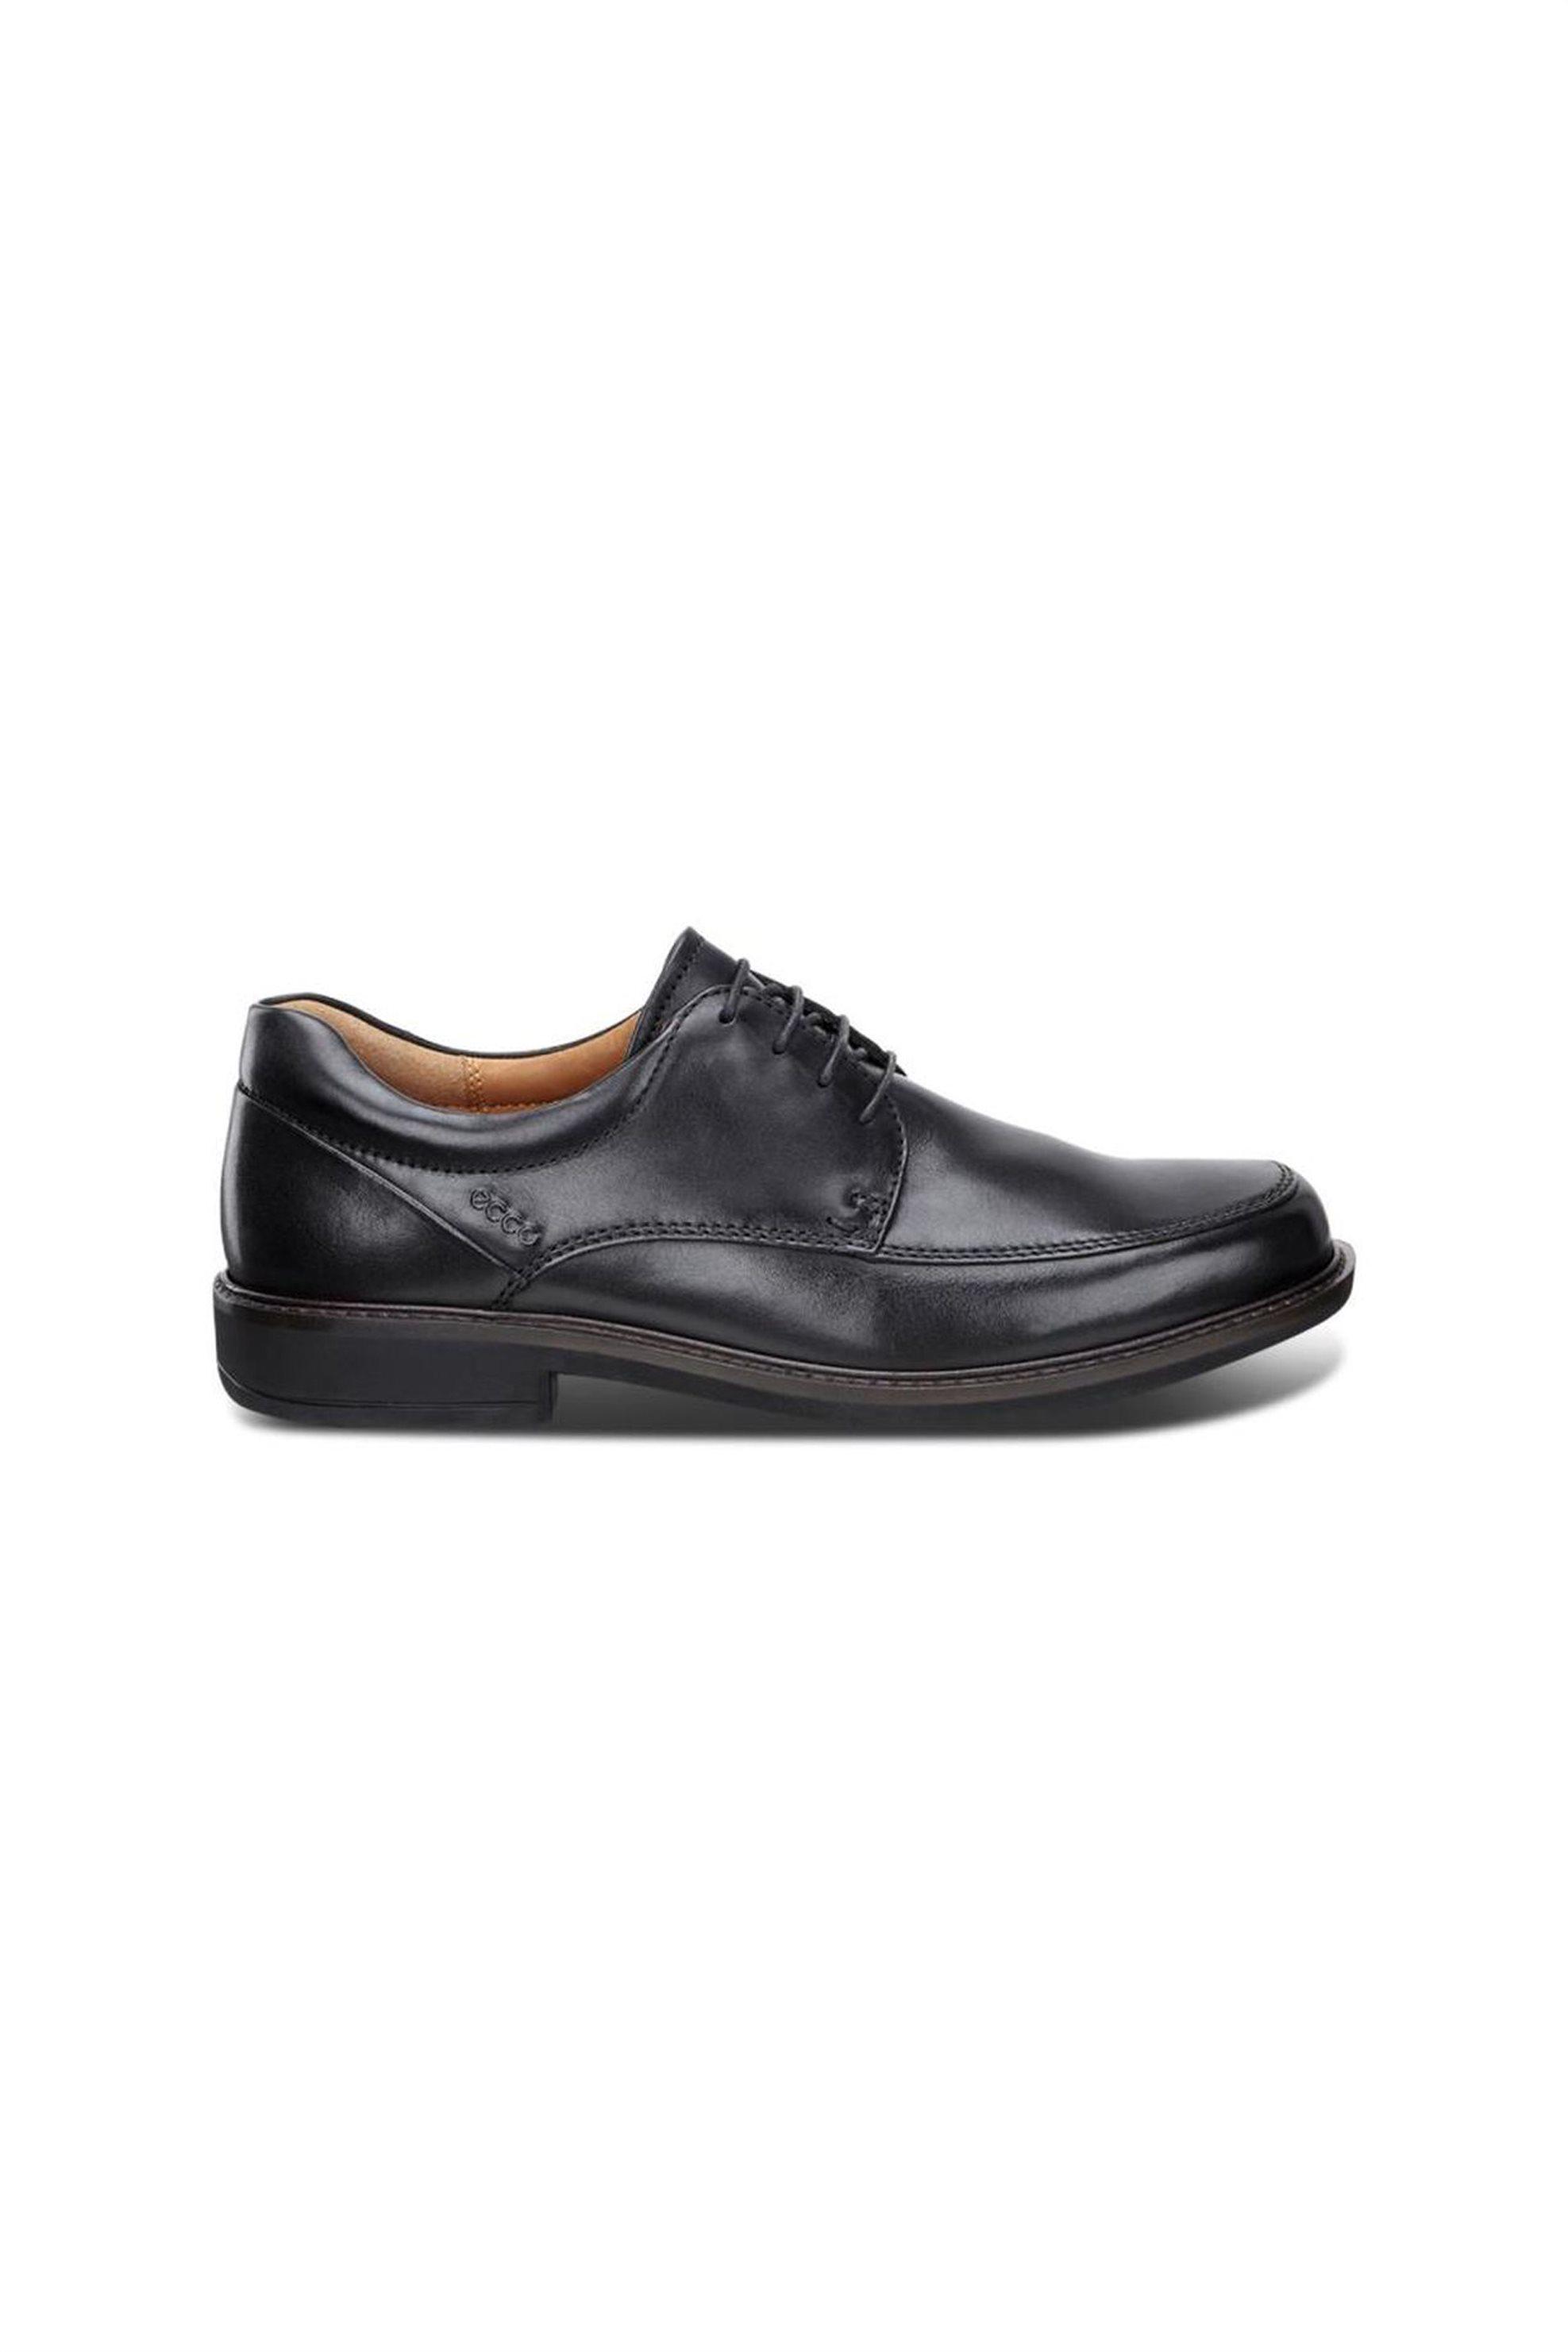 Ecco ανδρικό δερμάτινο παπούτσι Oxford με κορδόνια – 621114 – Μαύρο